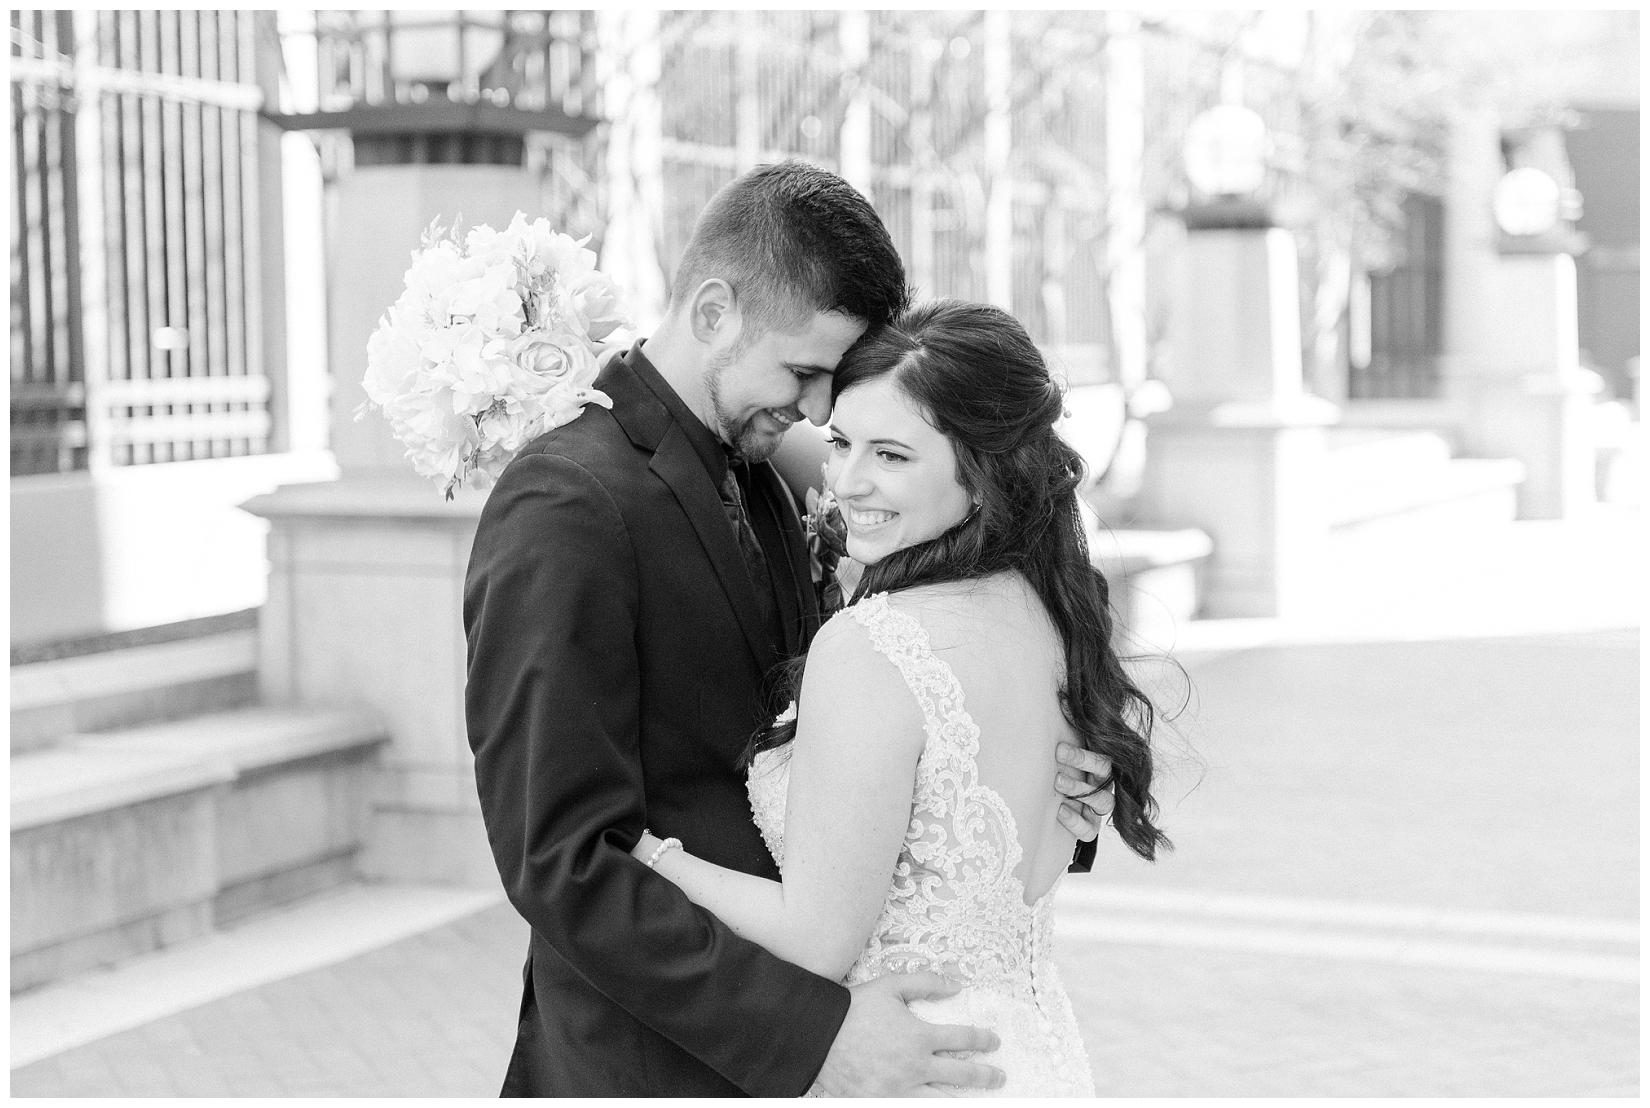 cat-alkire-wedding-photographer-indiana-chicago-indianapolis-fort-wayne_1108.jpg